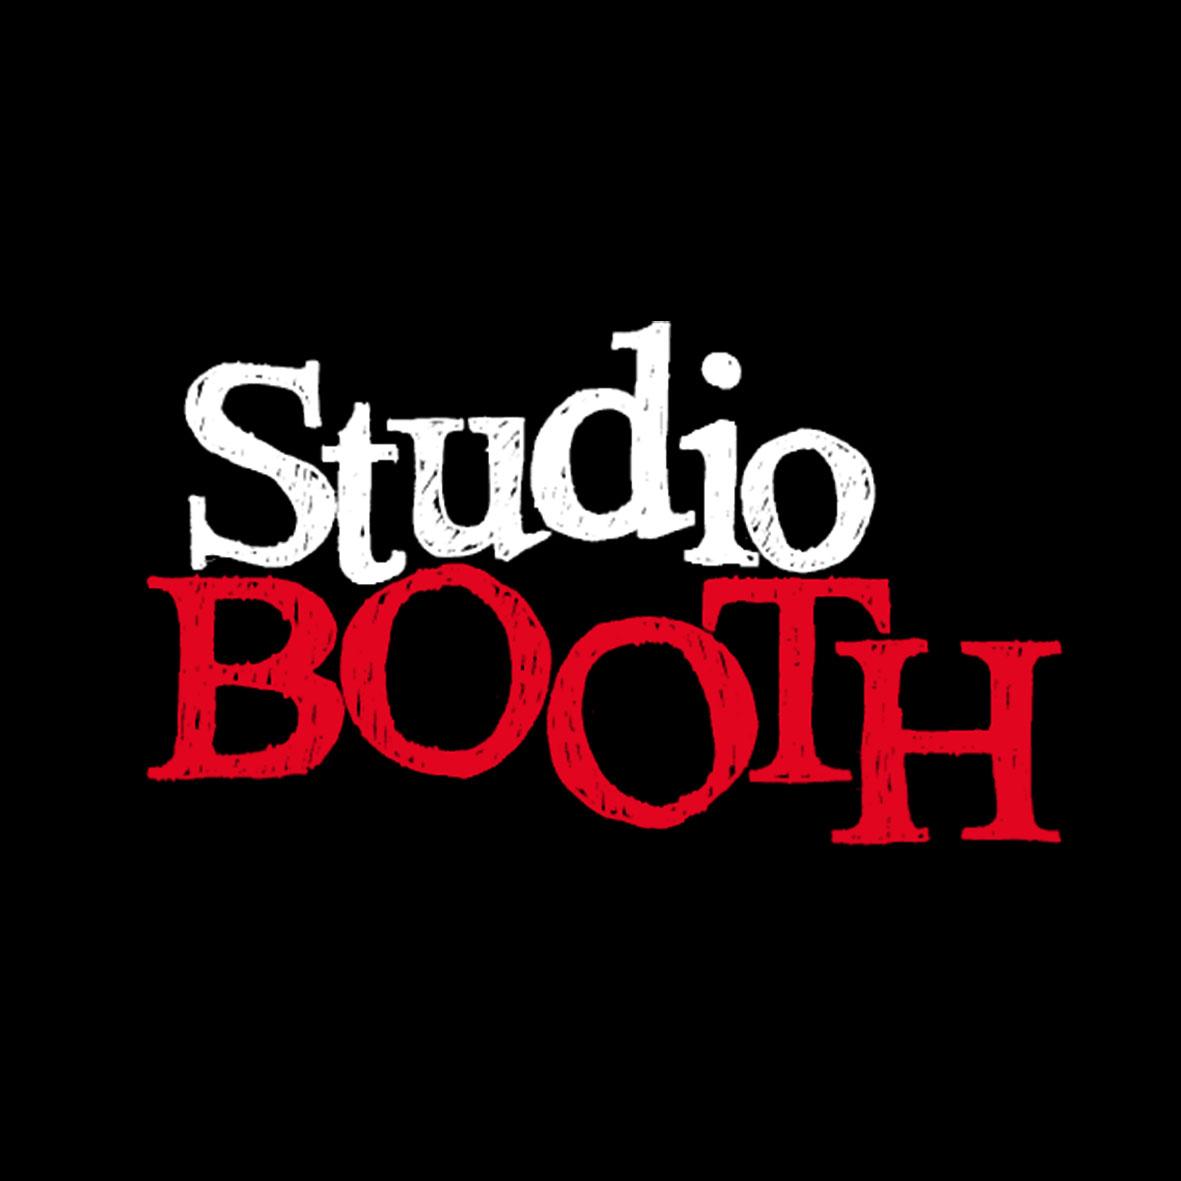 photobooth événementiel